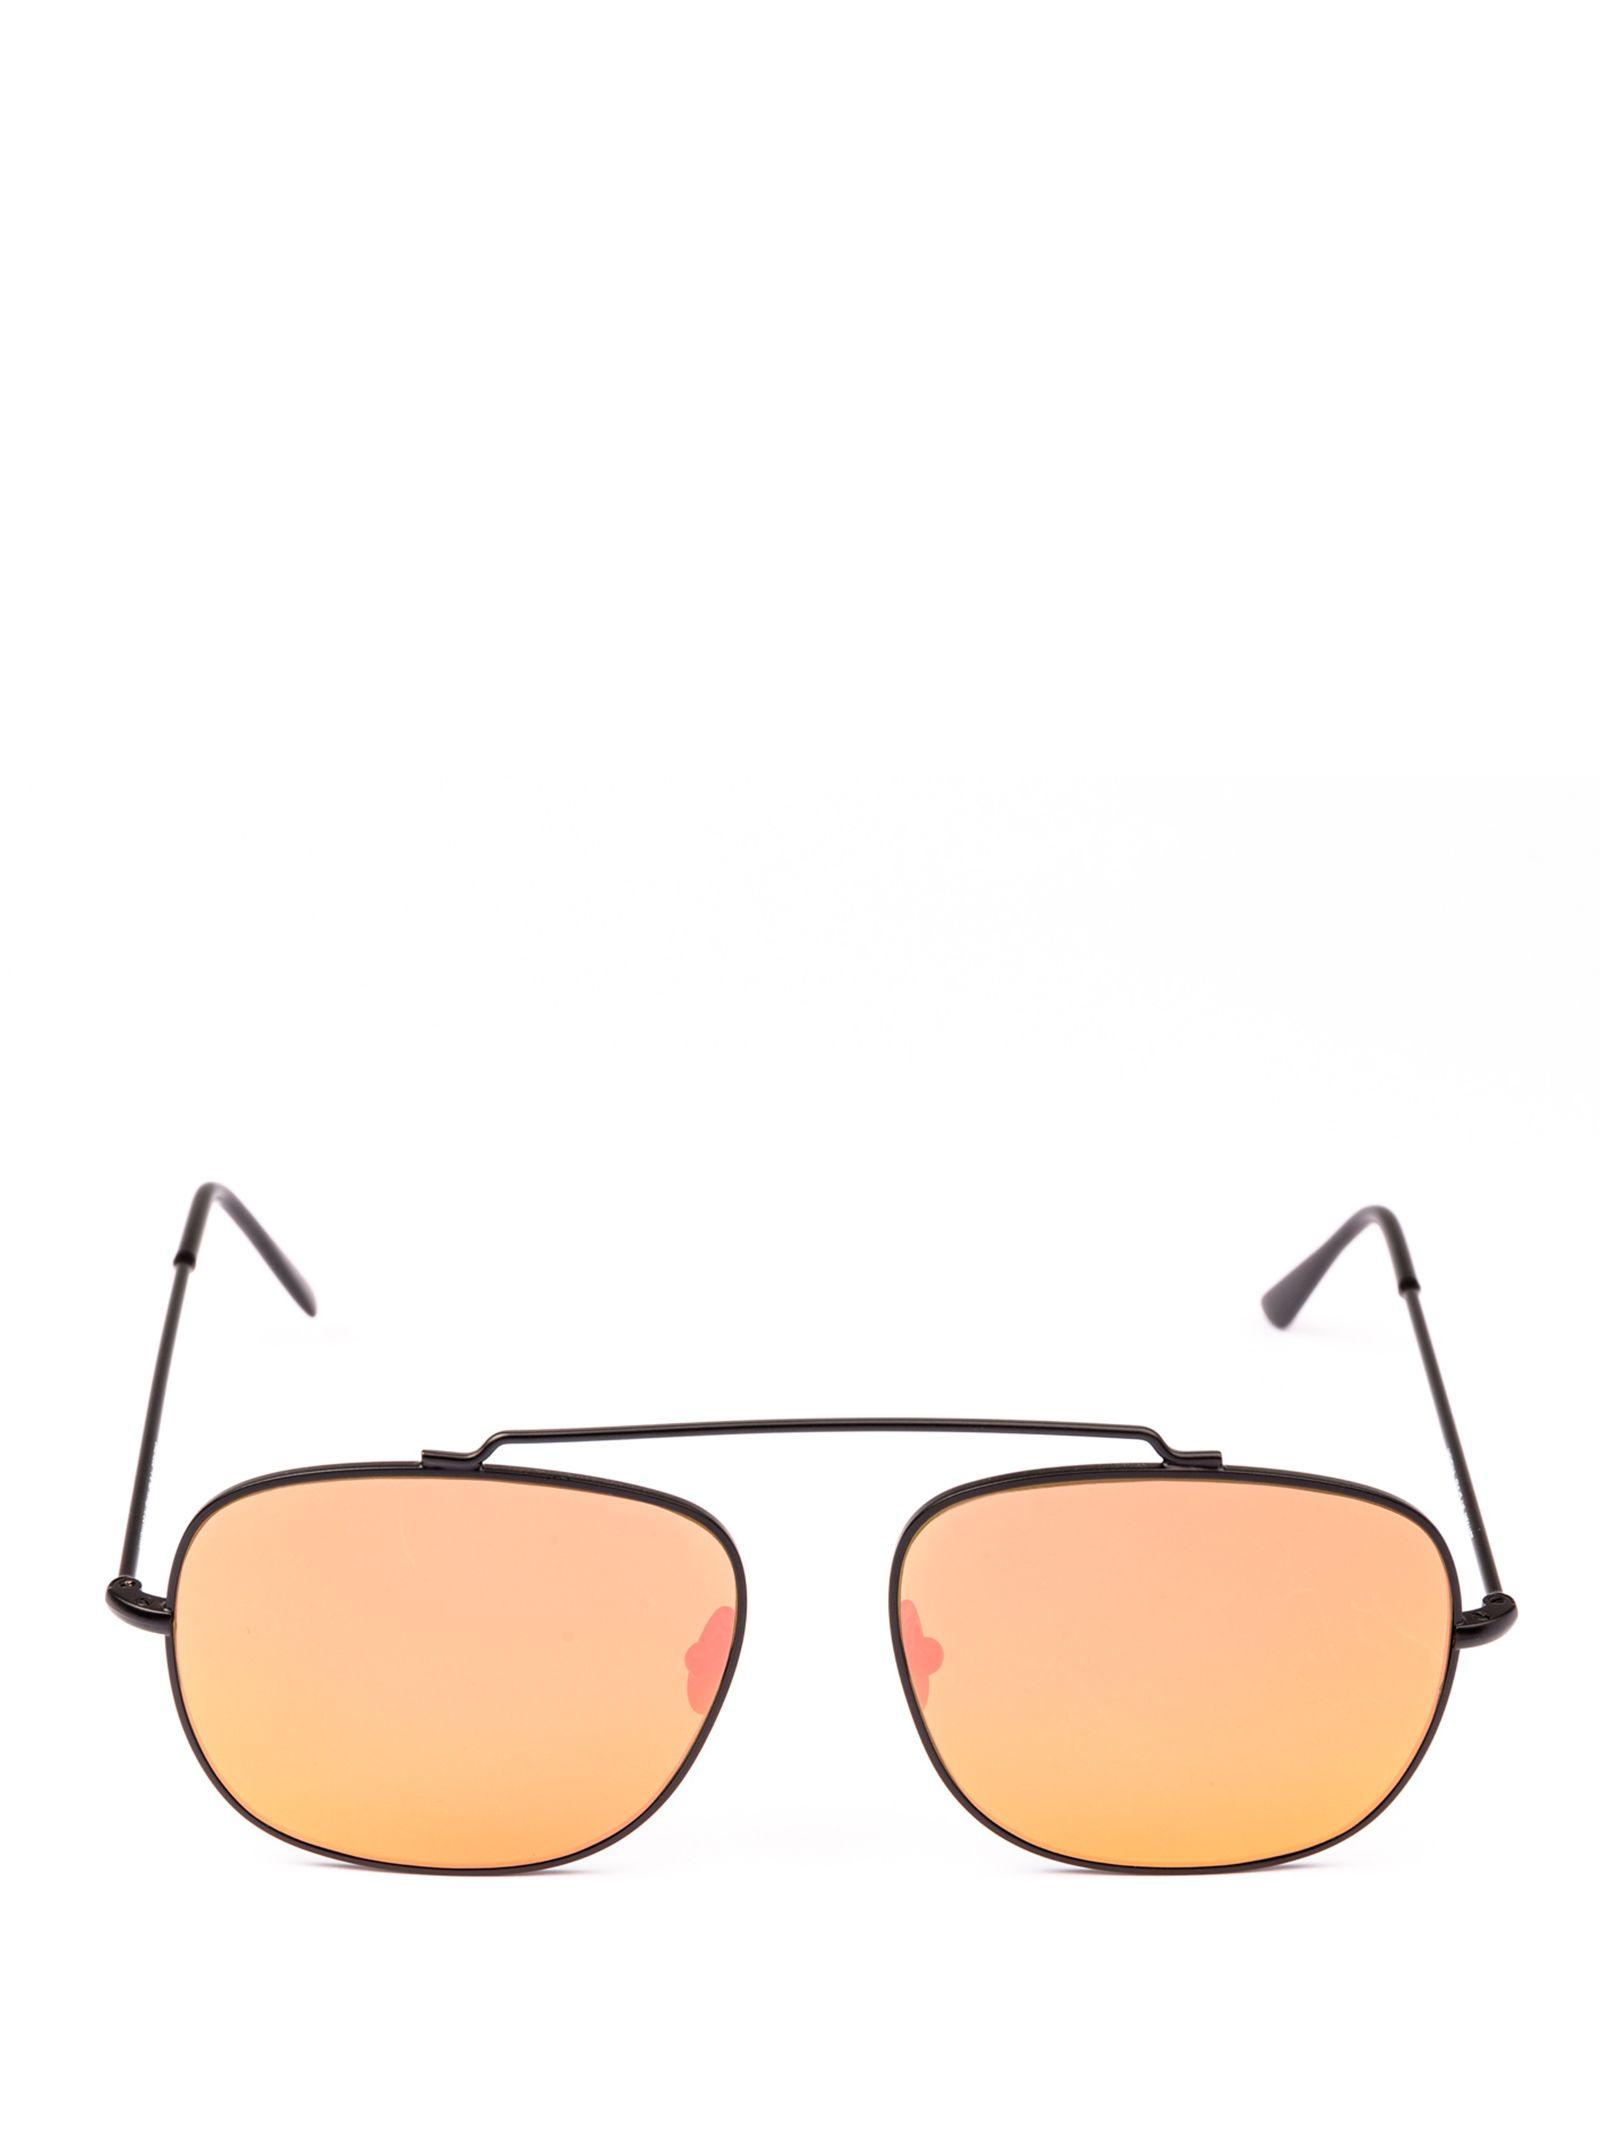 SPEKTRE Sunglasses in Mo01Dft